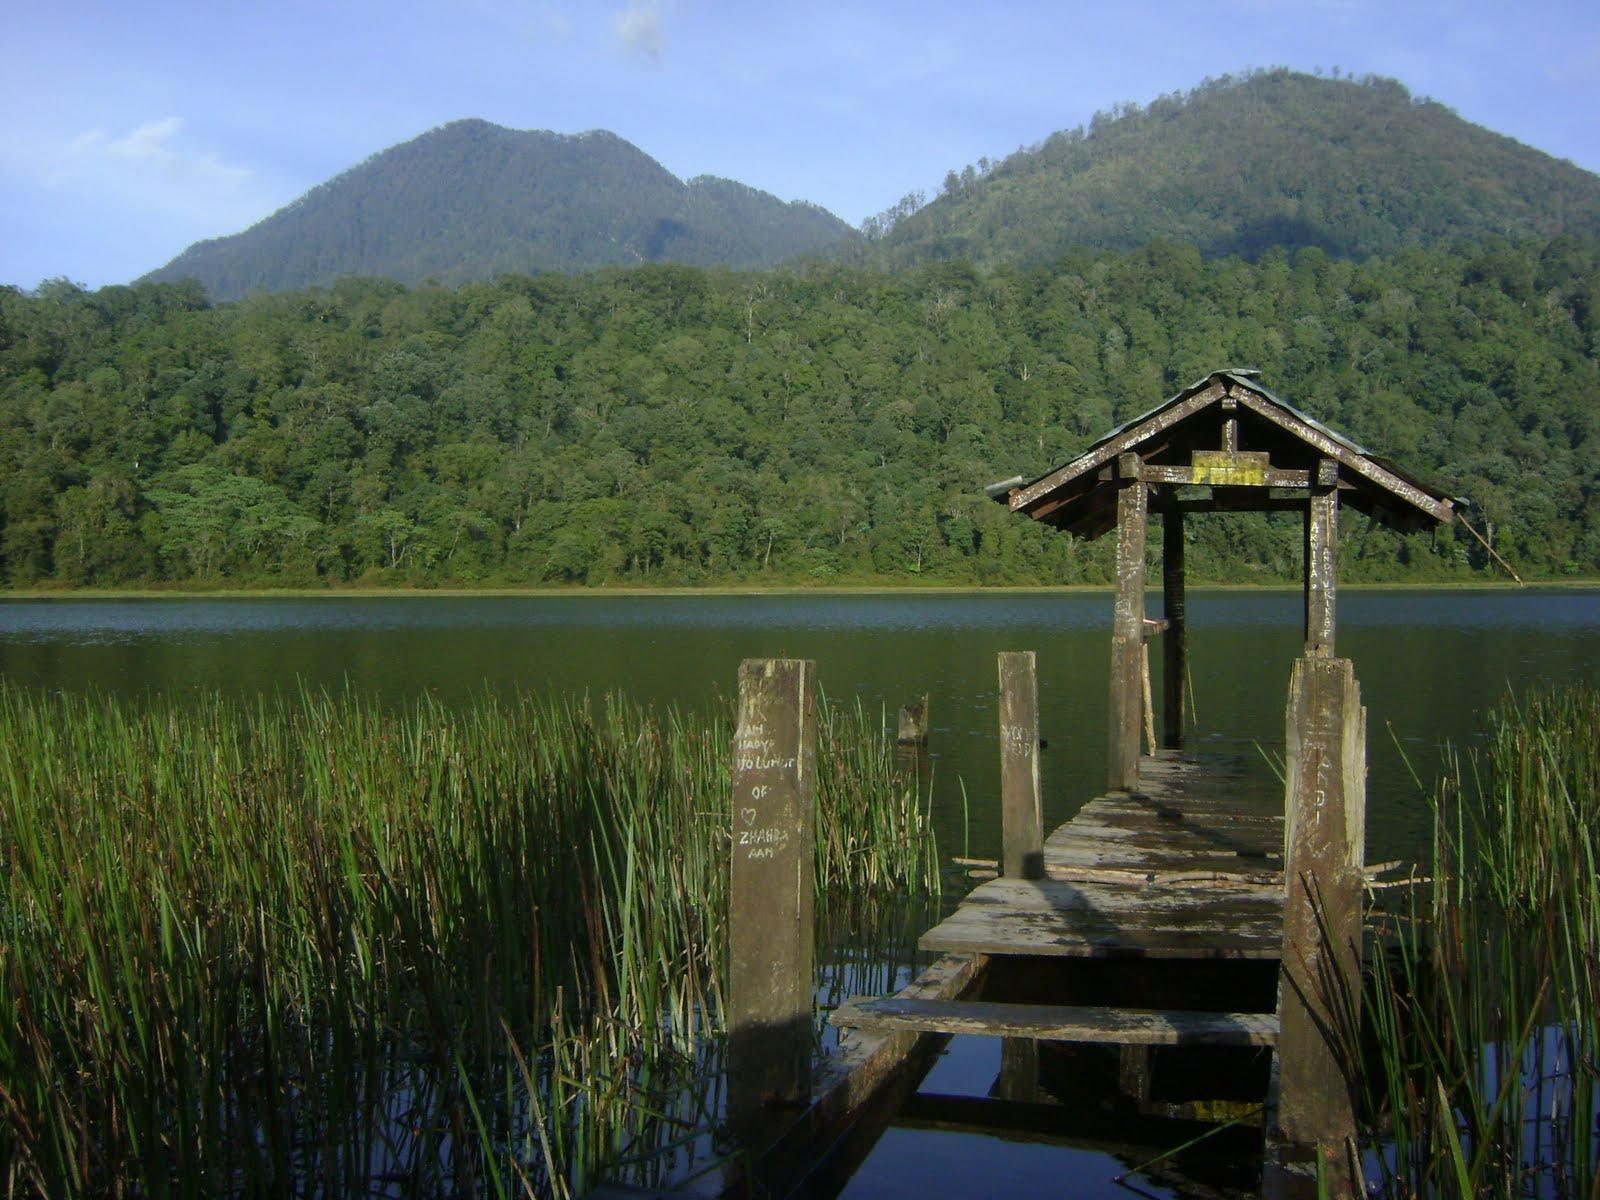 Garba Wira Bhuana Gunung Argopuro Bremi Baderan Gbr 6 Taman